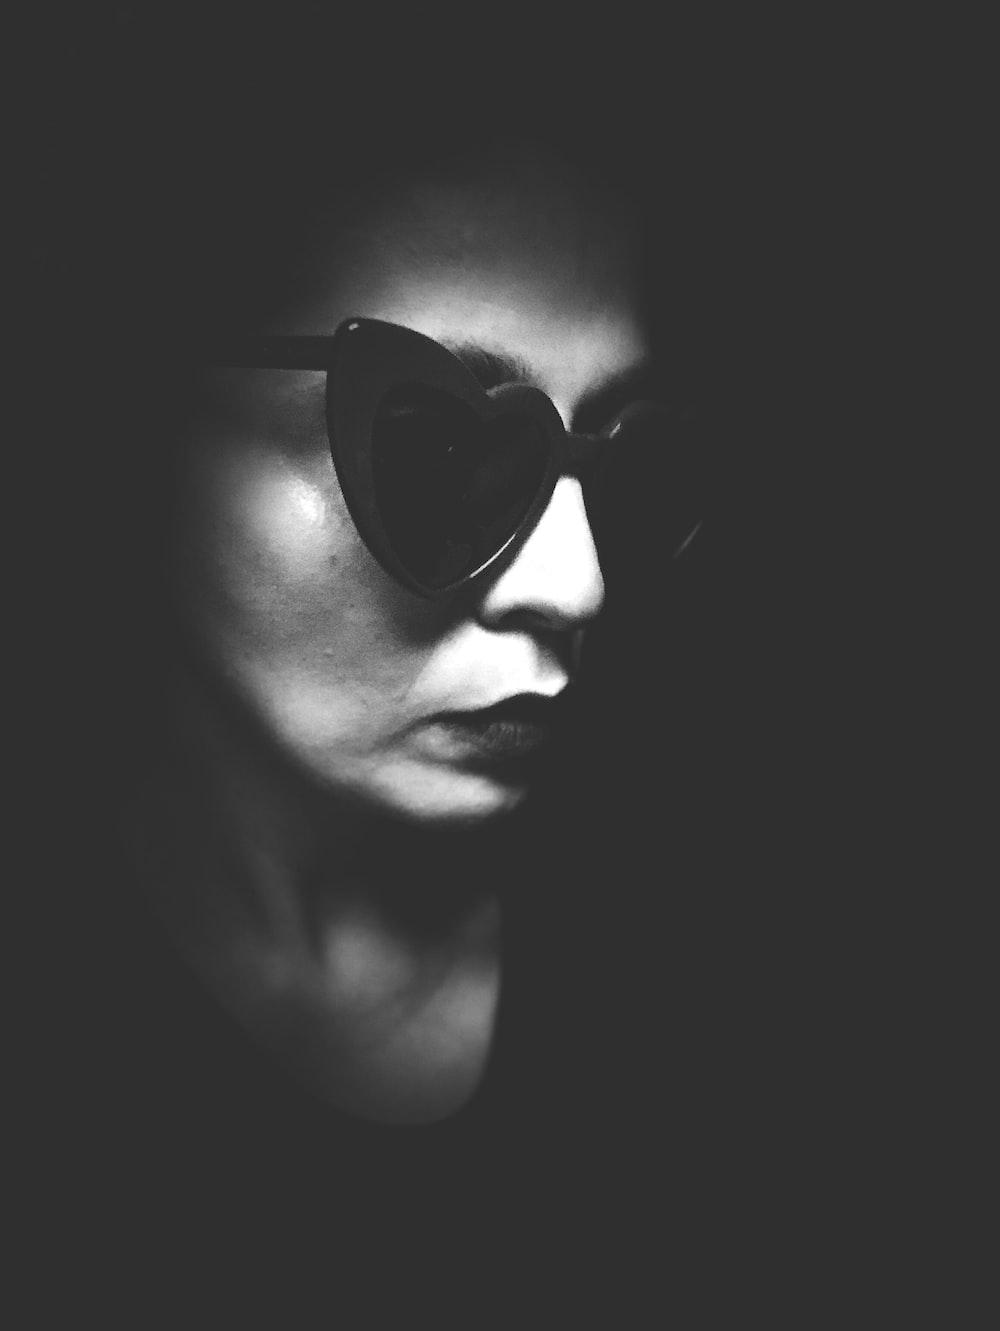 woman wearing black frame sunglasses